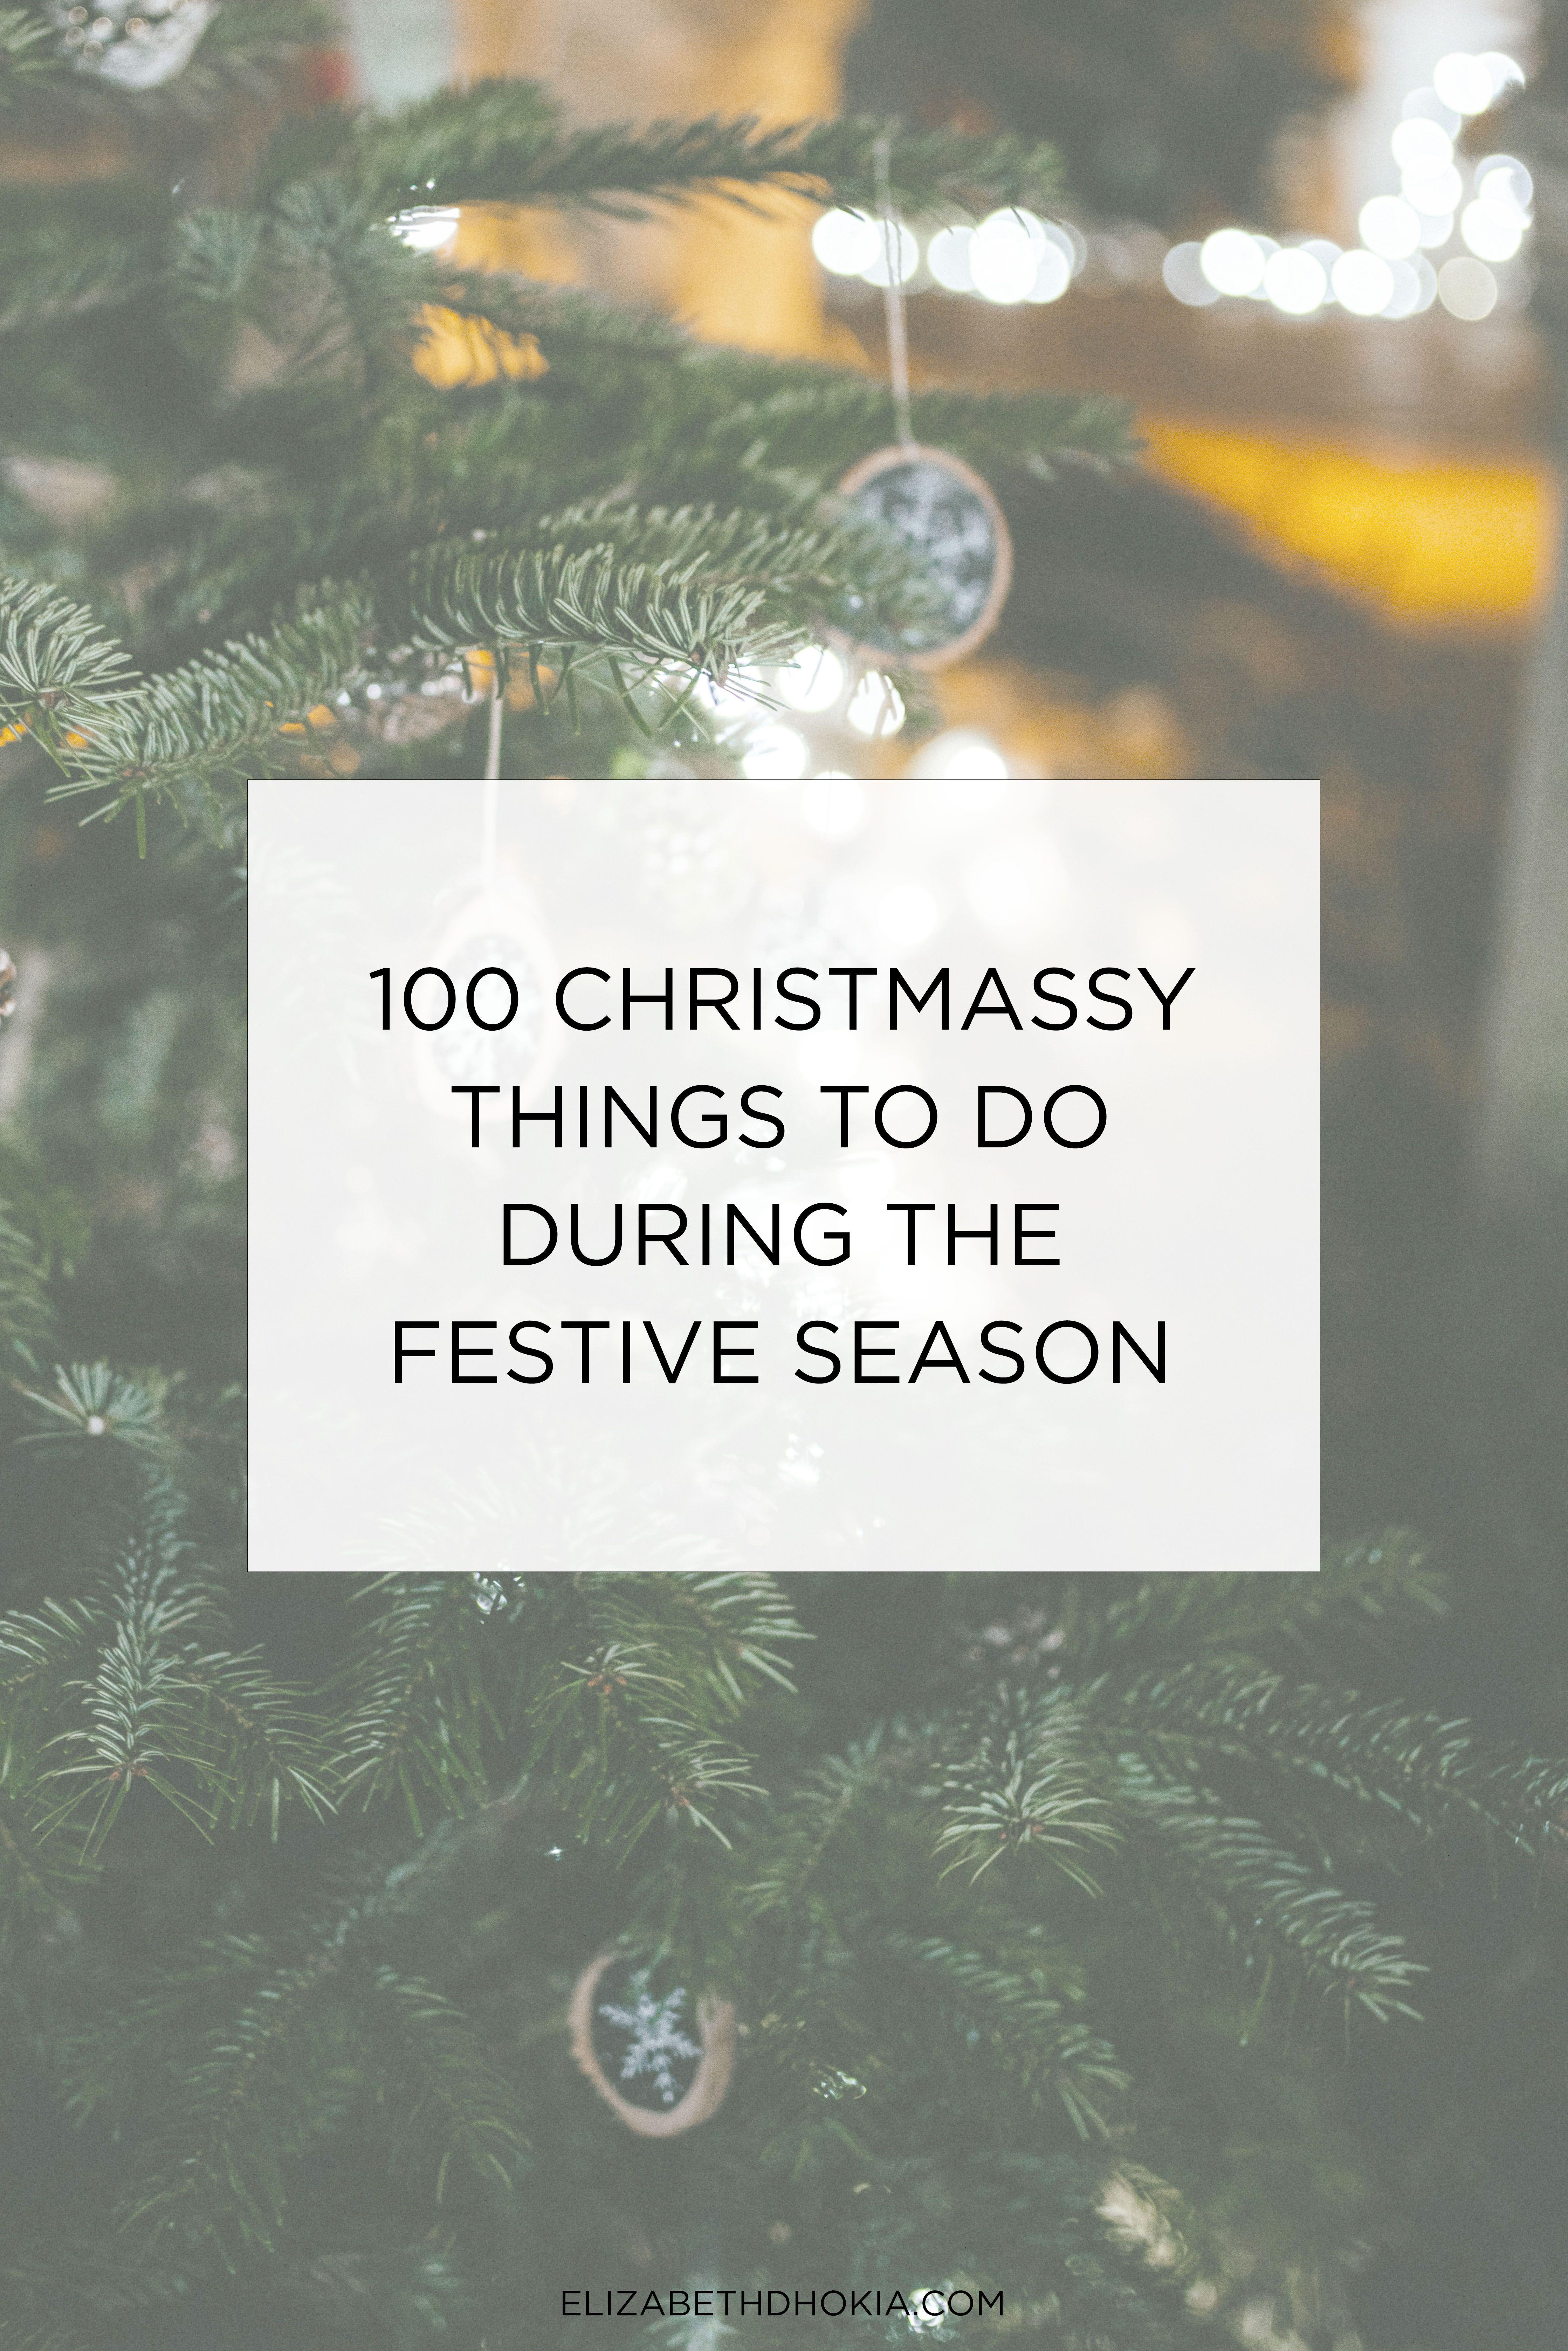 100 Christmassy Things To Do This Festive Season In 2020 100 Things To Do Things To Do Christmas Deserts